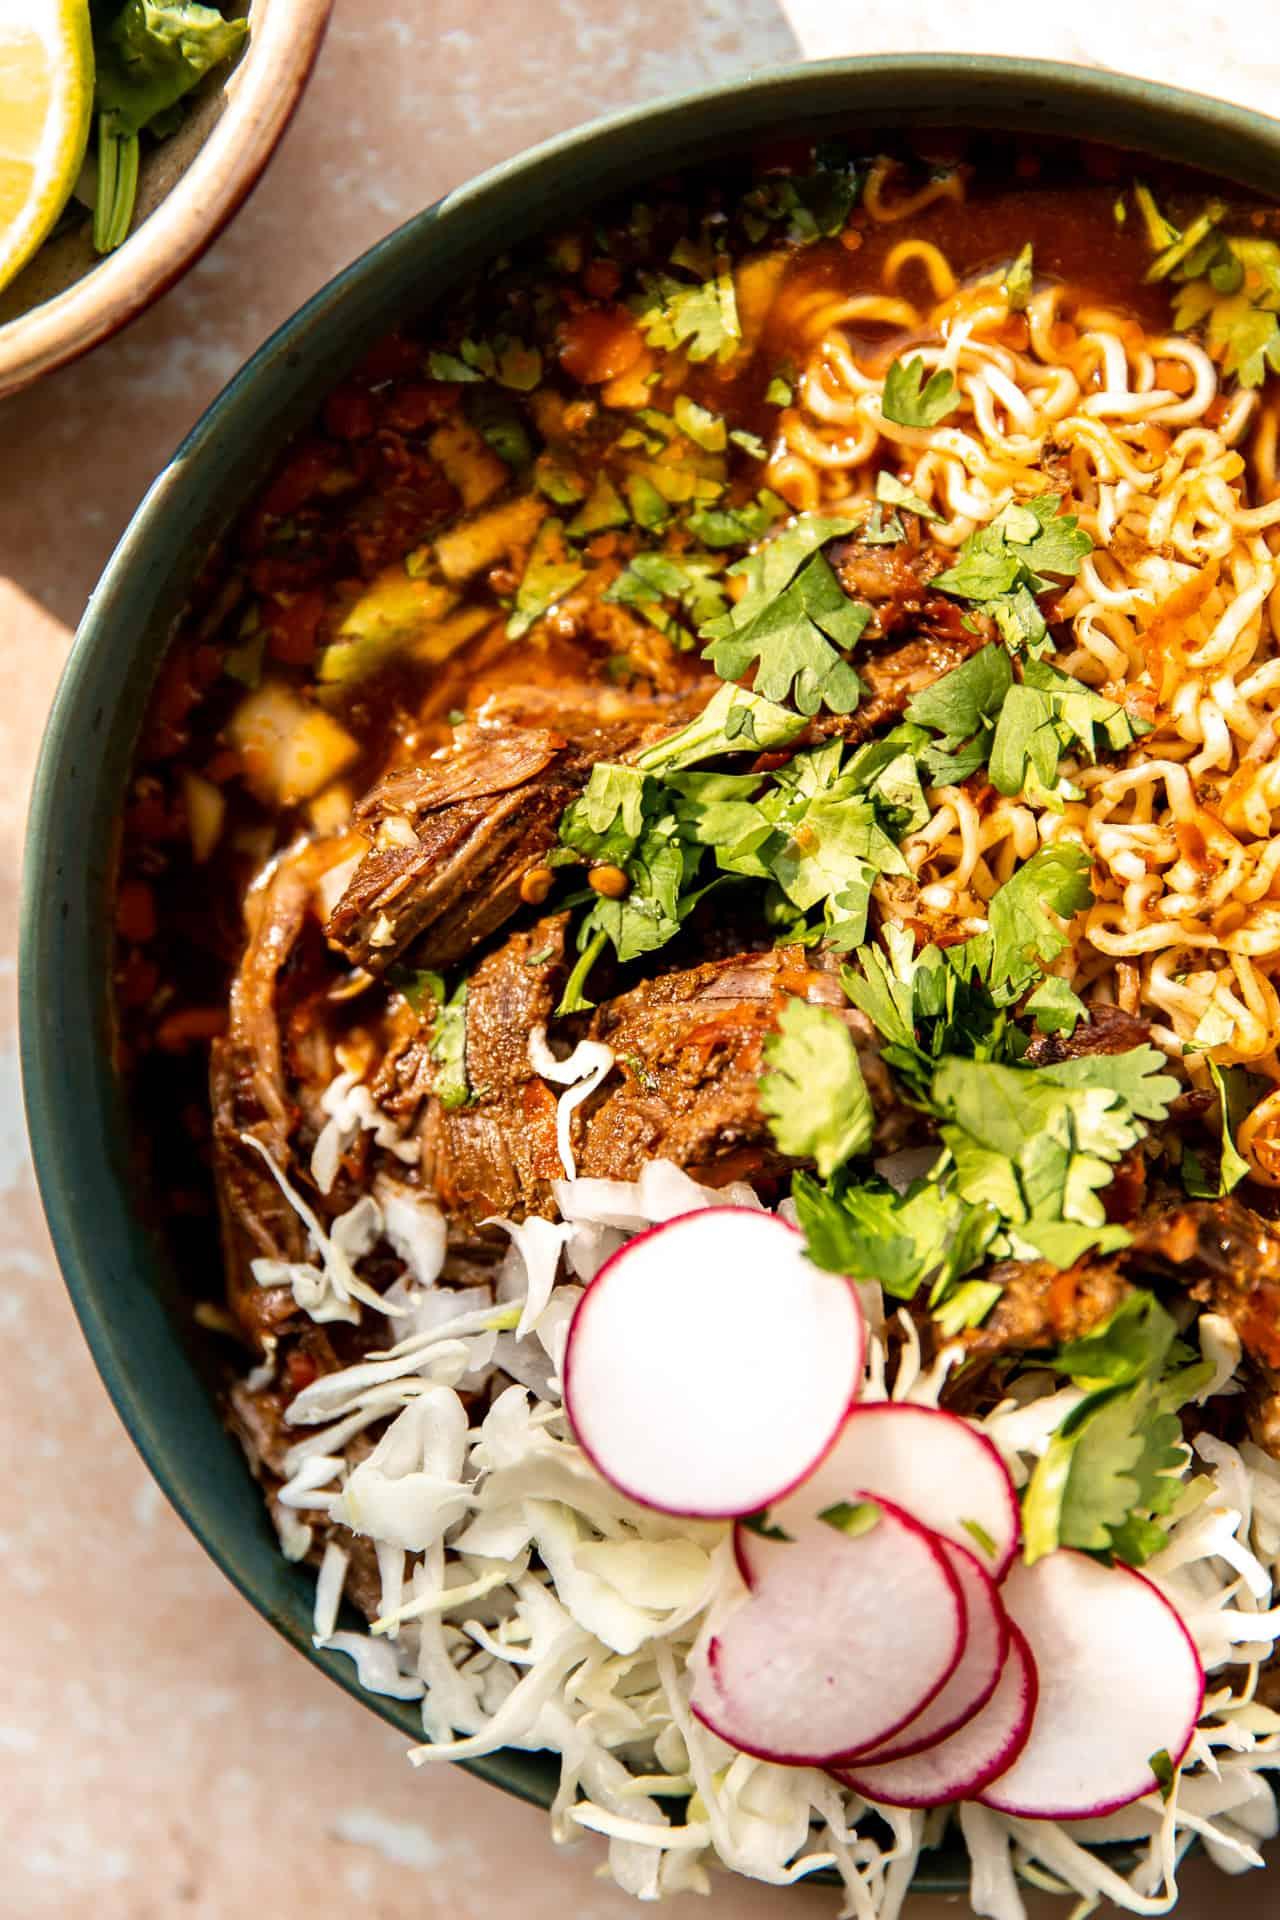 Close up view of chopped birria meat in a bowl of ramen.